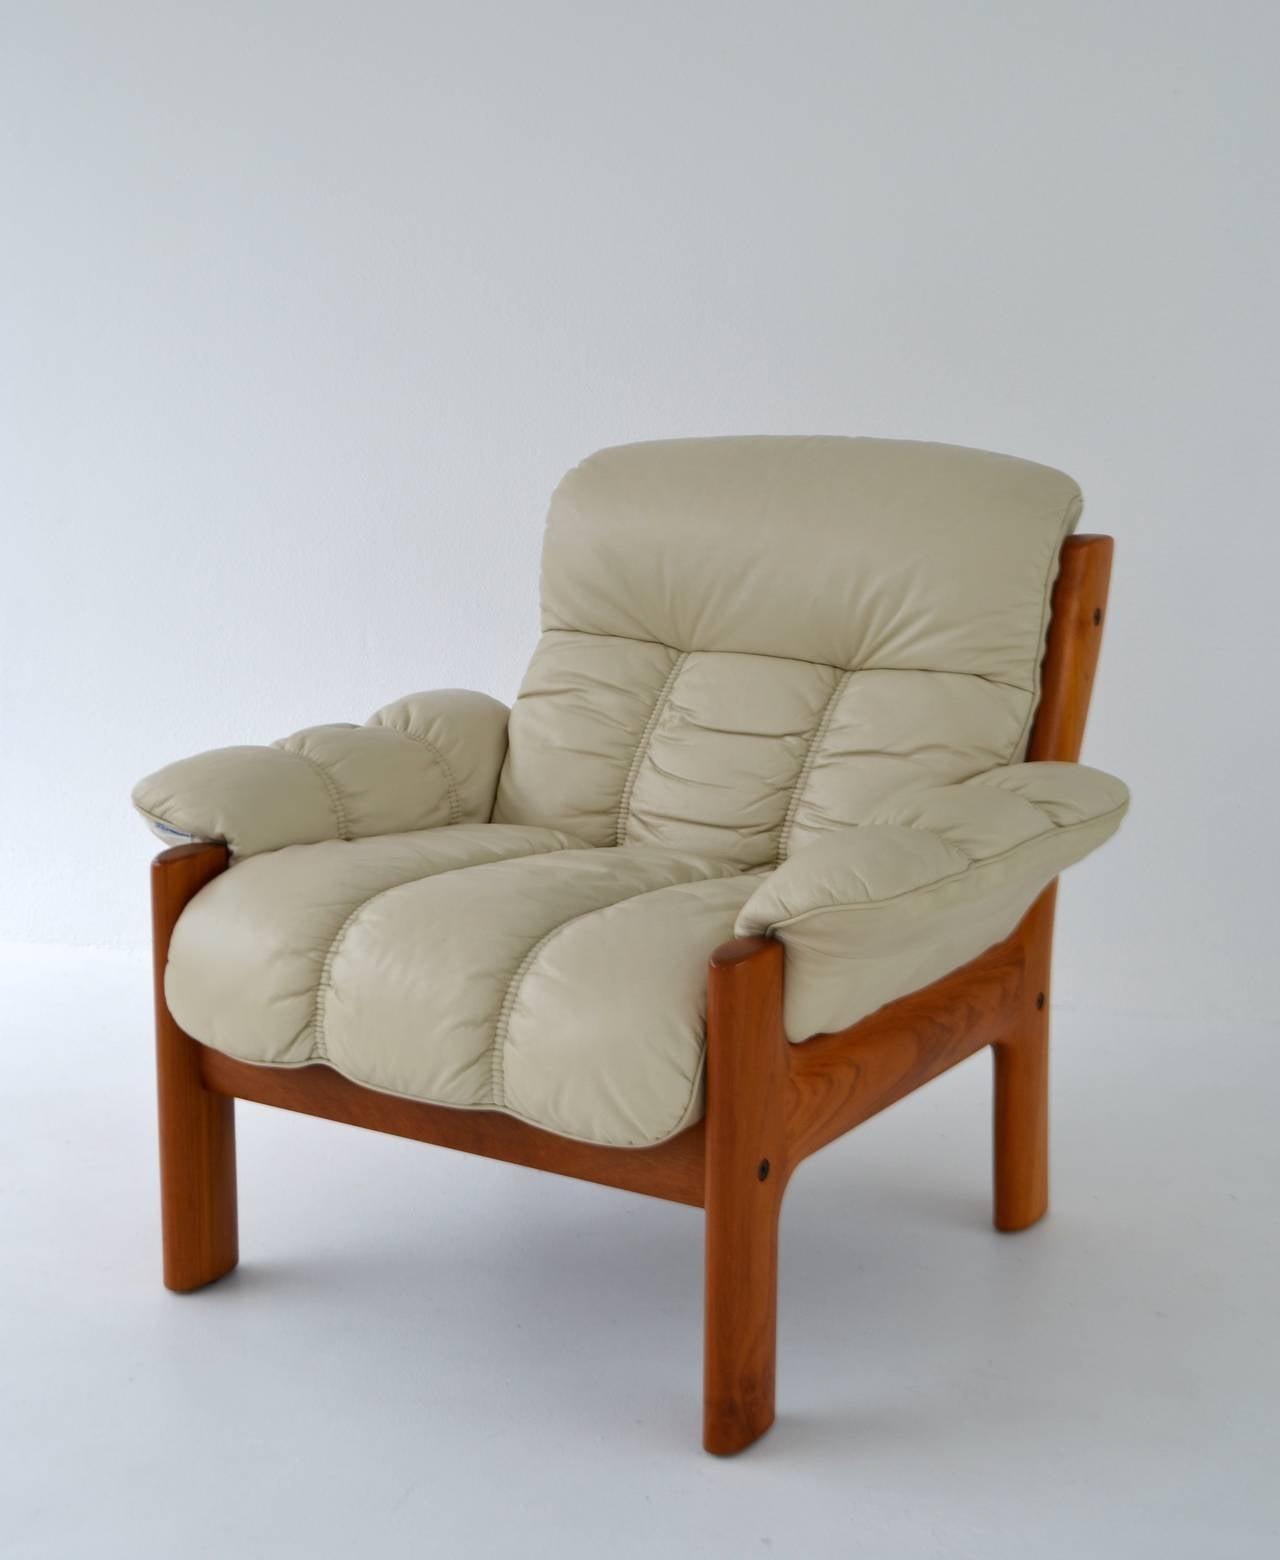 Postmodern Leather and Teak Club Chair by J E Ekornes For Sale